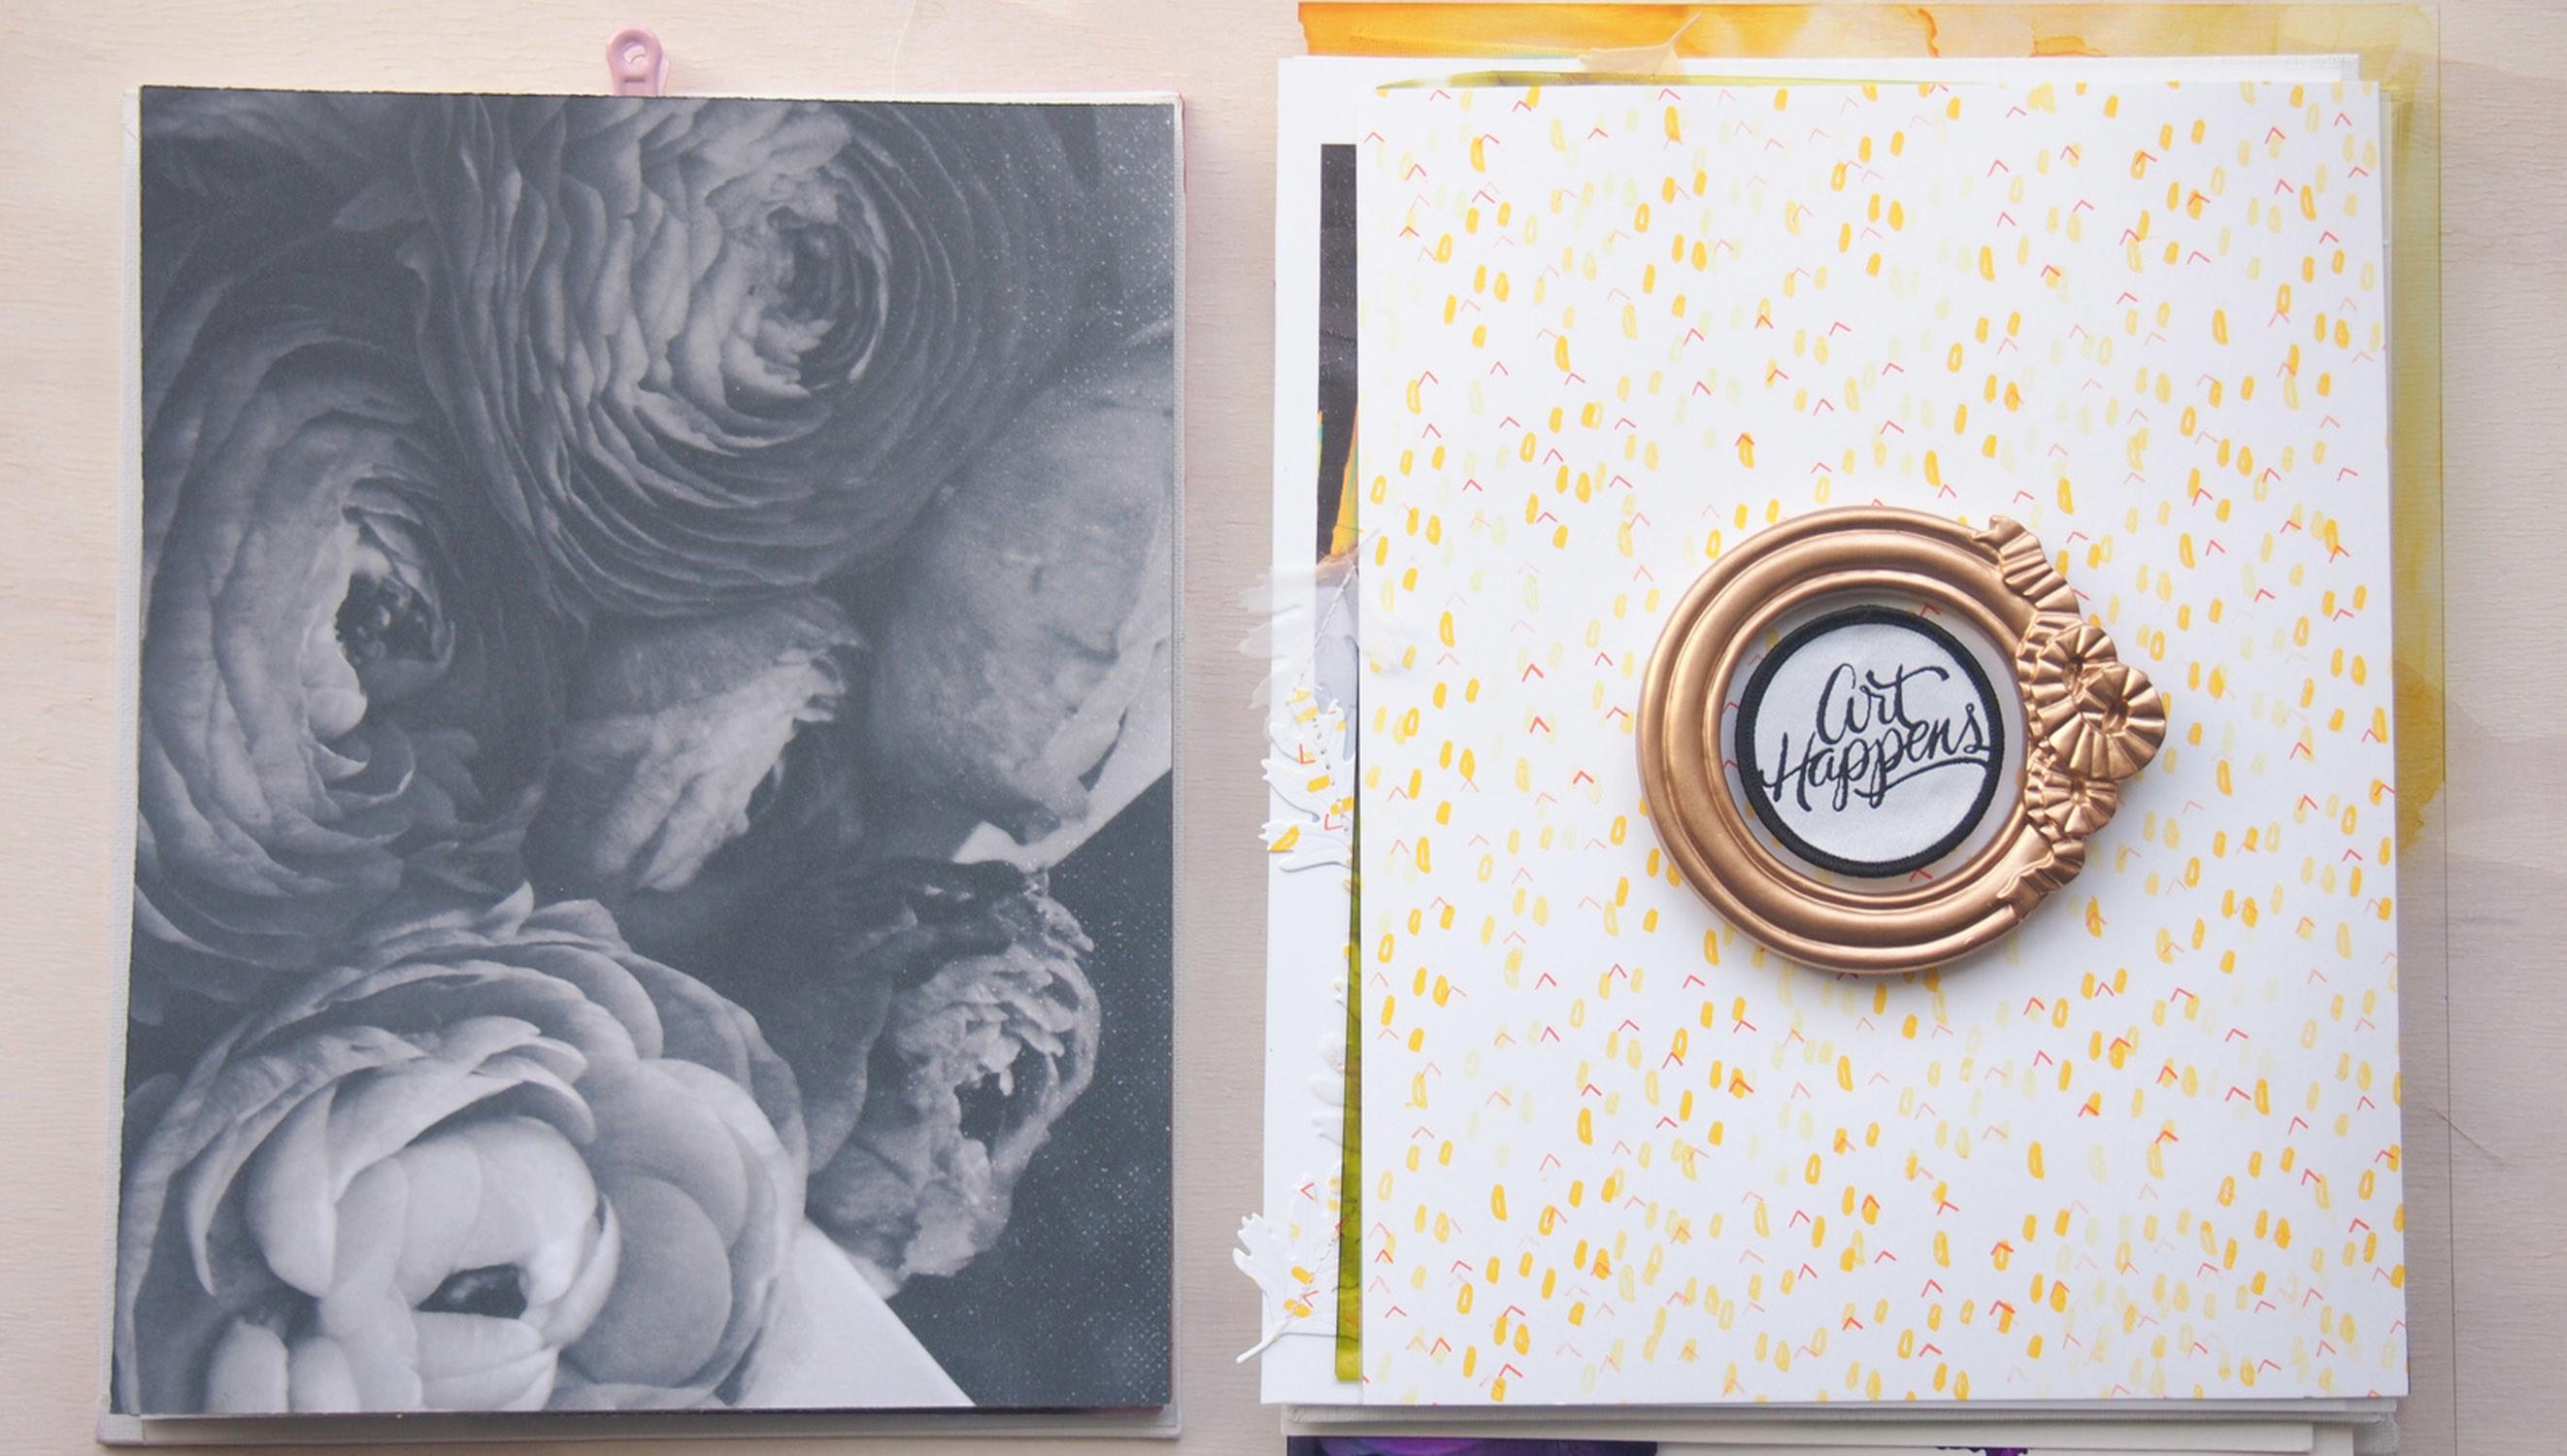 Picture 6 of Mixed Media Art & Prints Album at Big Picture Classes